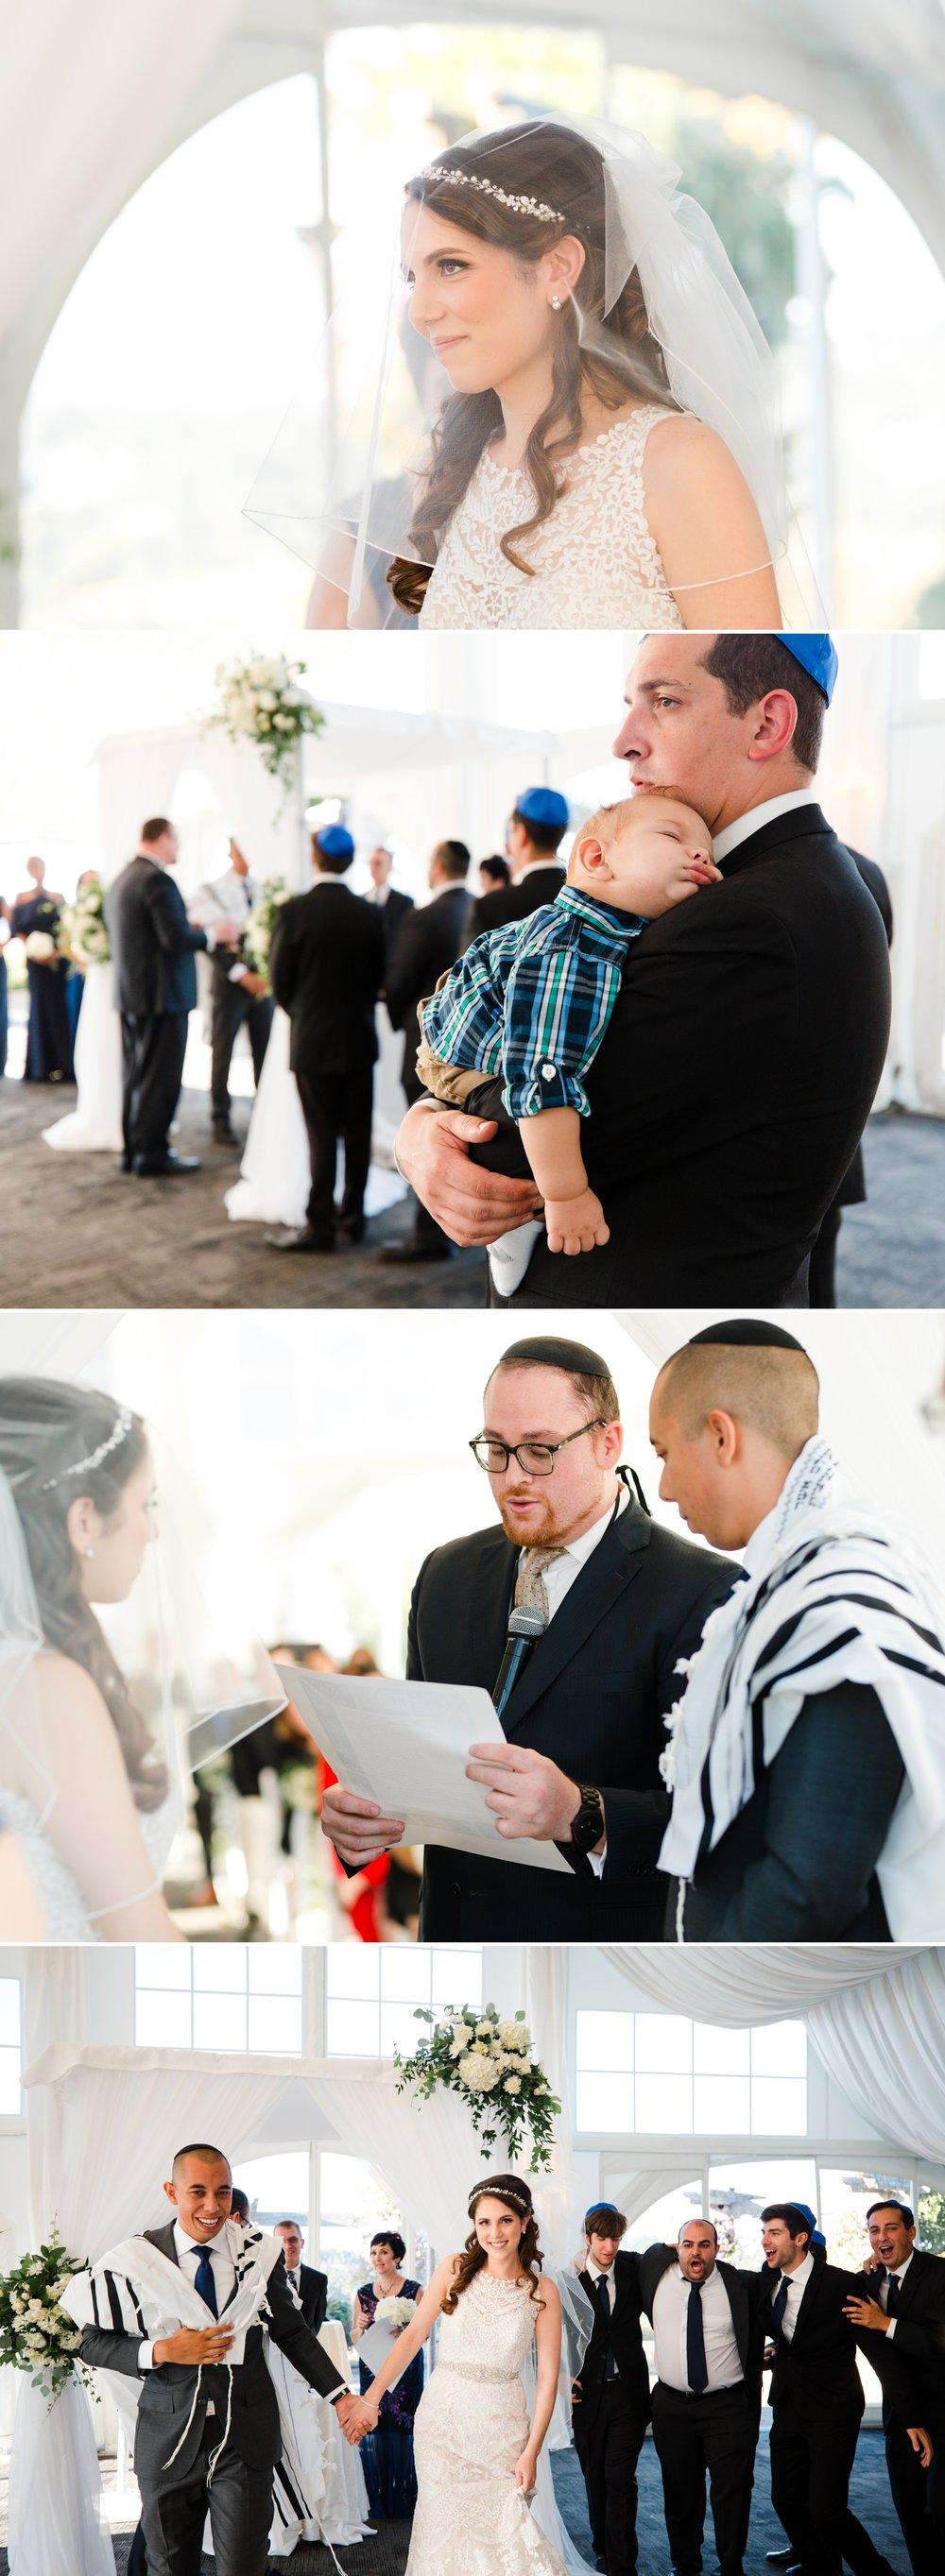 17-seattle-jewish-wedding-ceremony.jpg